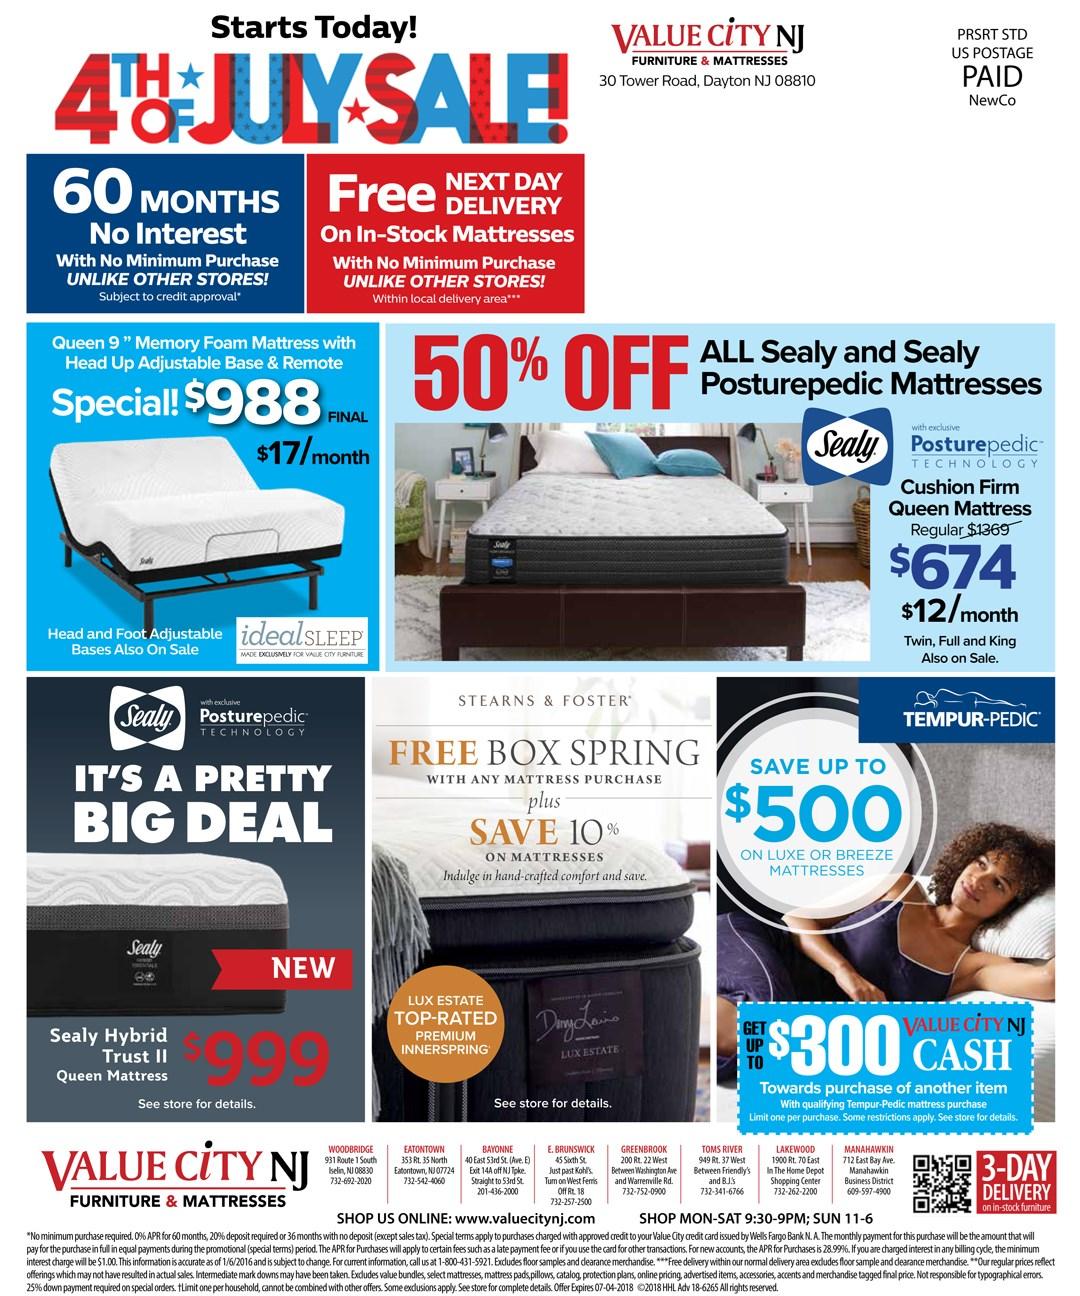 Value City NJ Online Promotions Circular